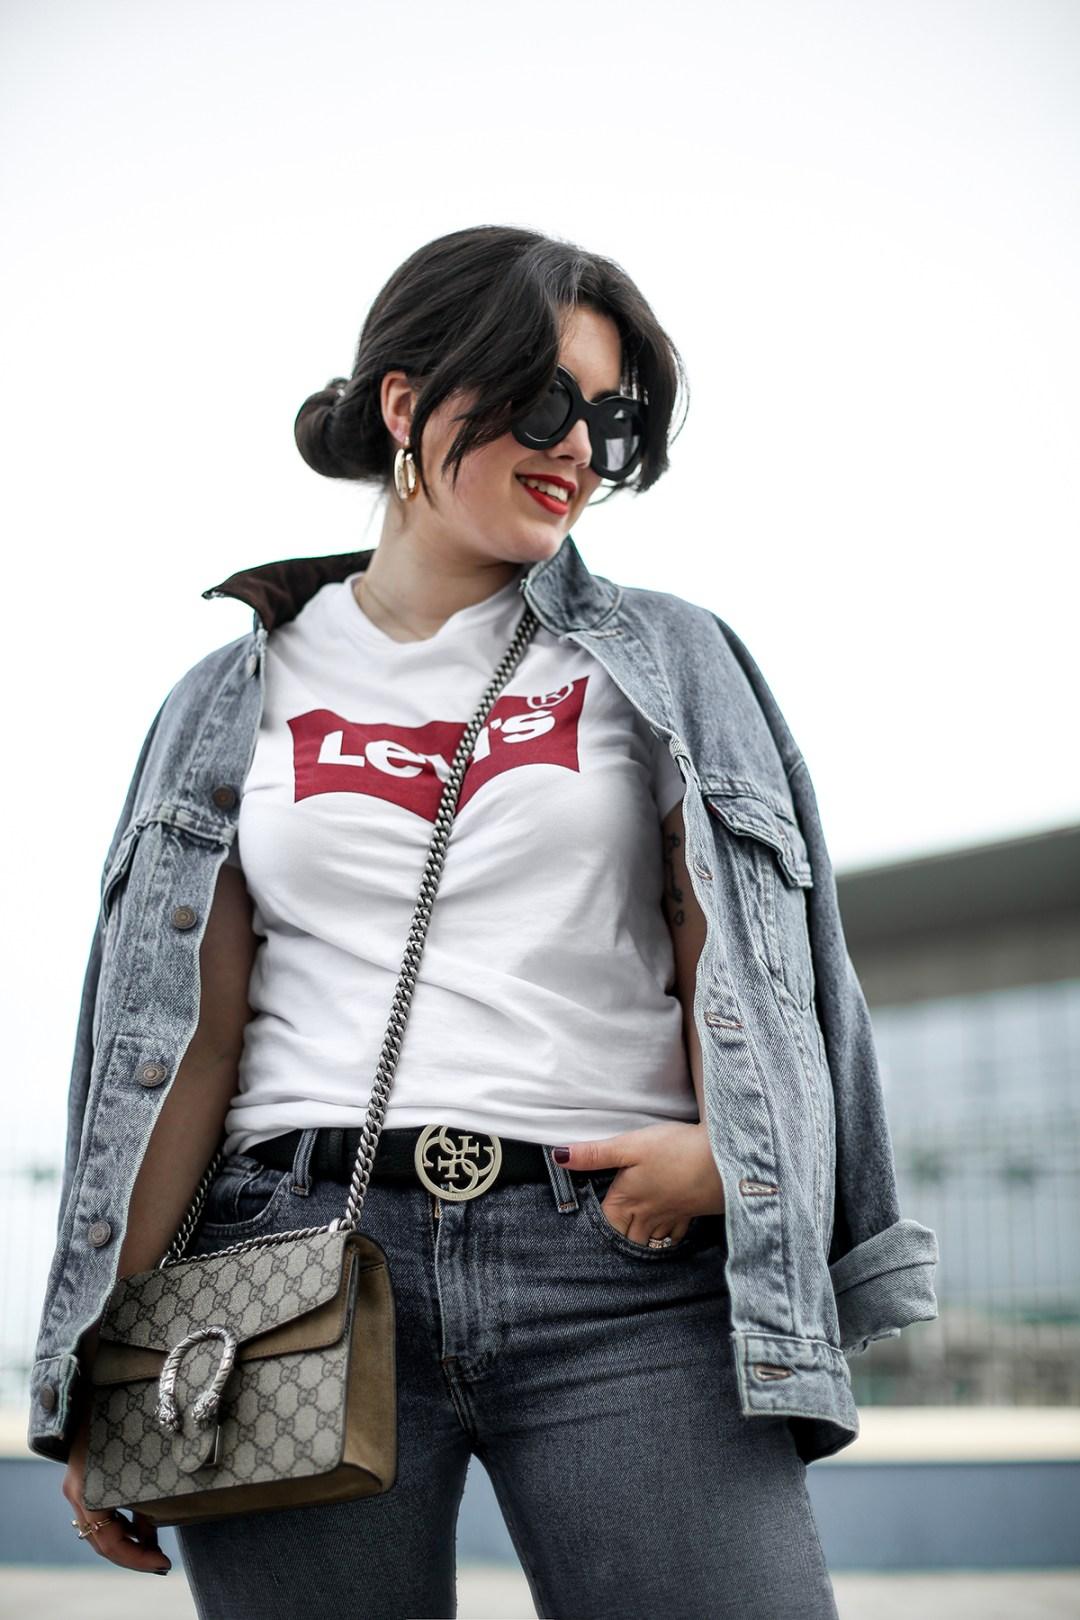 denim-total-look-levis-girl-vintage-gucci-horsebit-shoes-dionysus-bag9